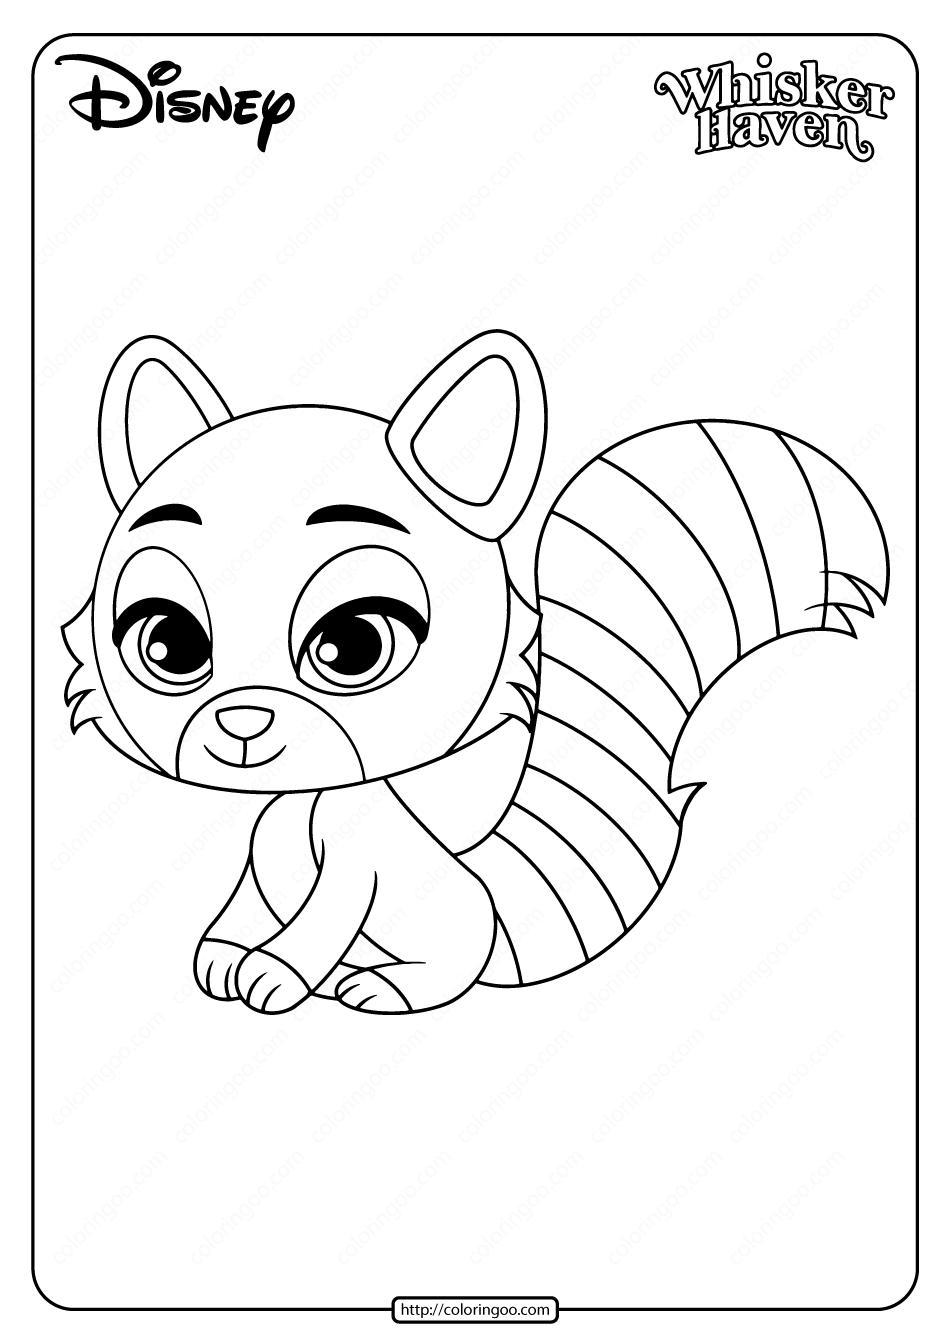 Printable Palace Pets Chai Pdf Coloring Page In 2020 Coloring Pages Panda Coloring Pages Palace Pets